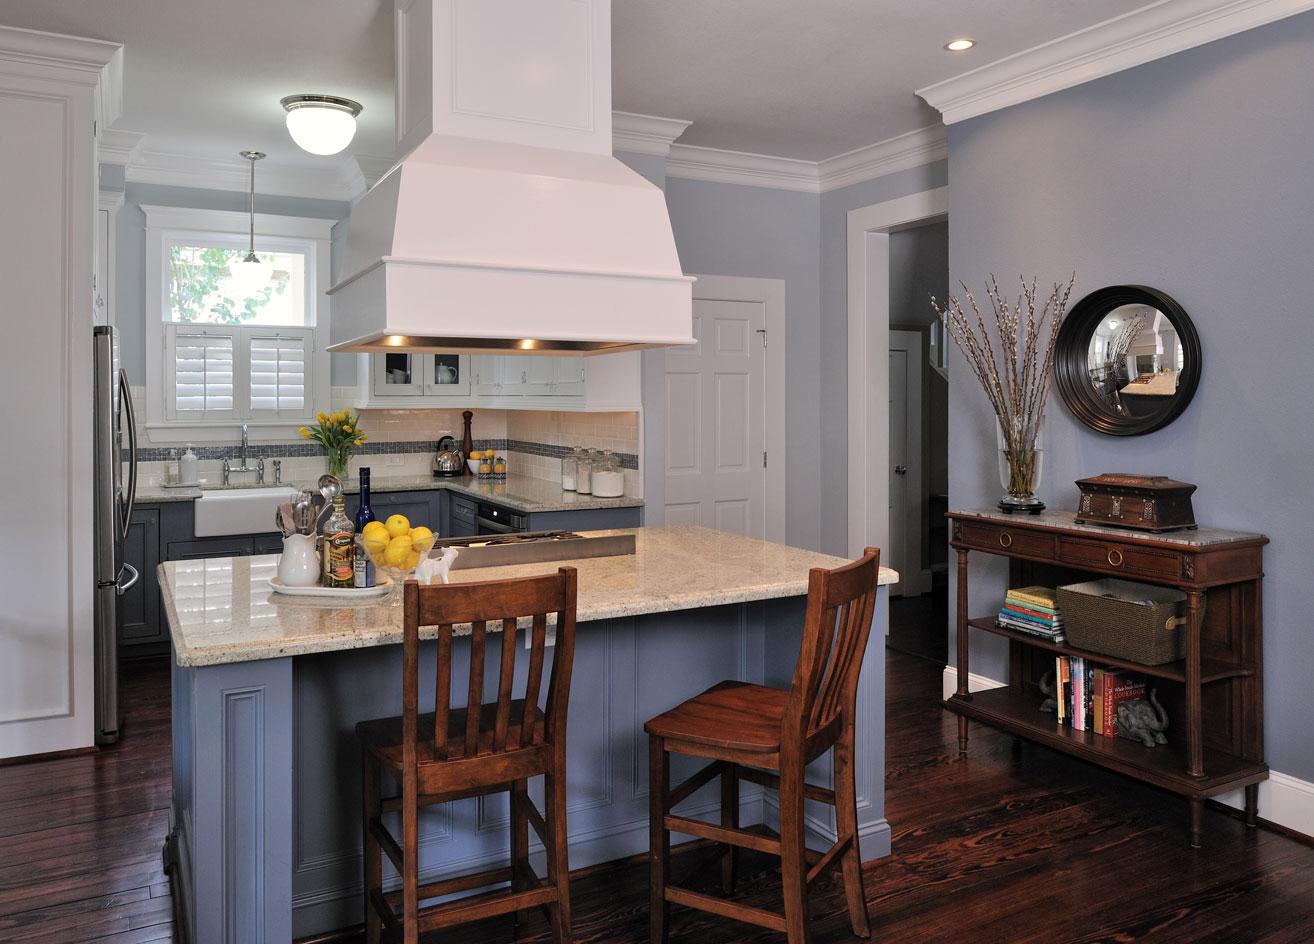 Blue and white kitchen, Designer: Carla Aston